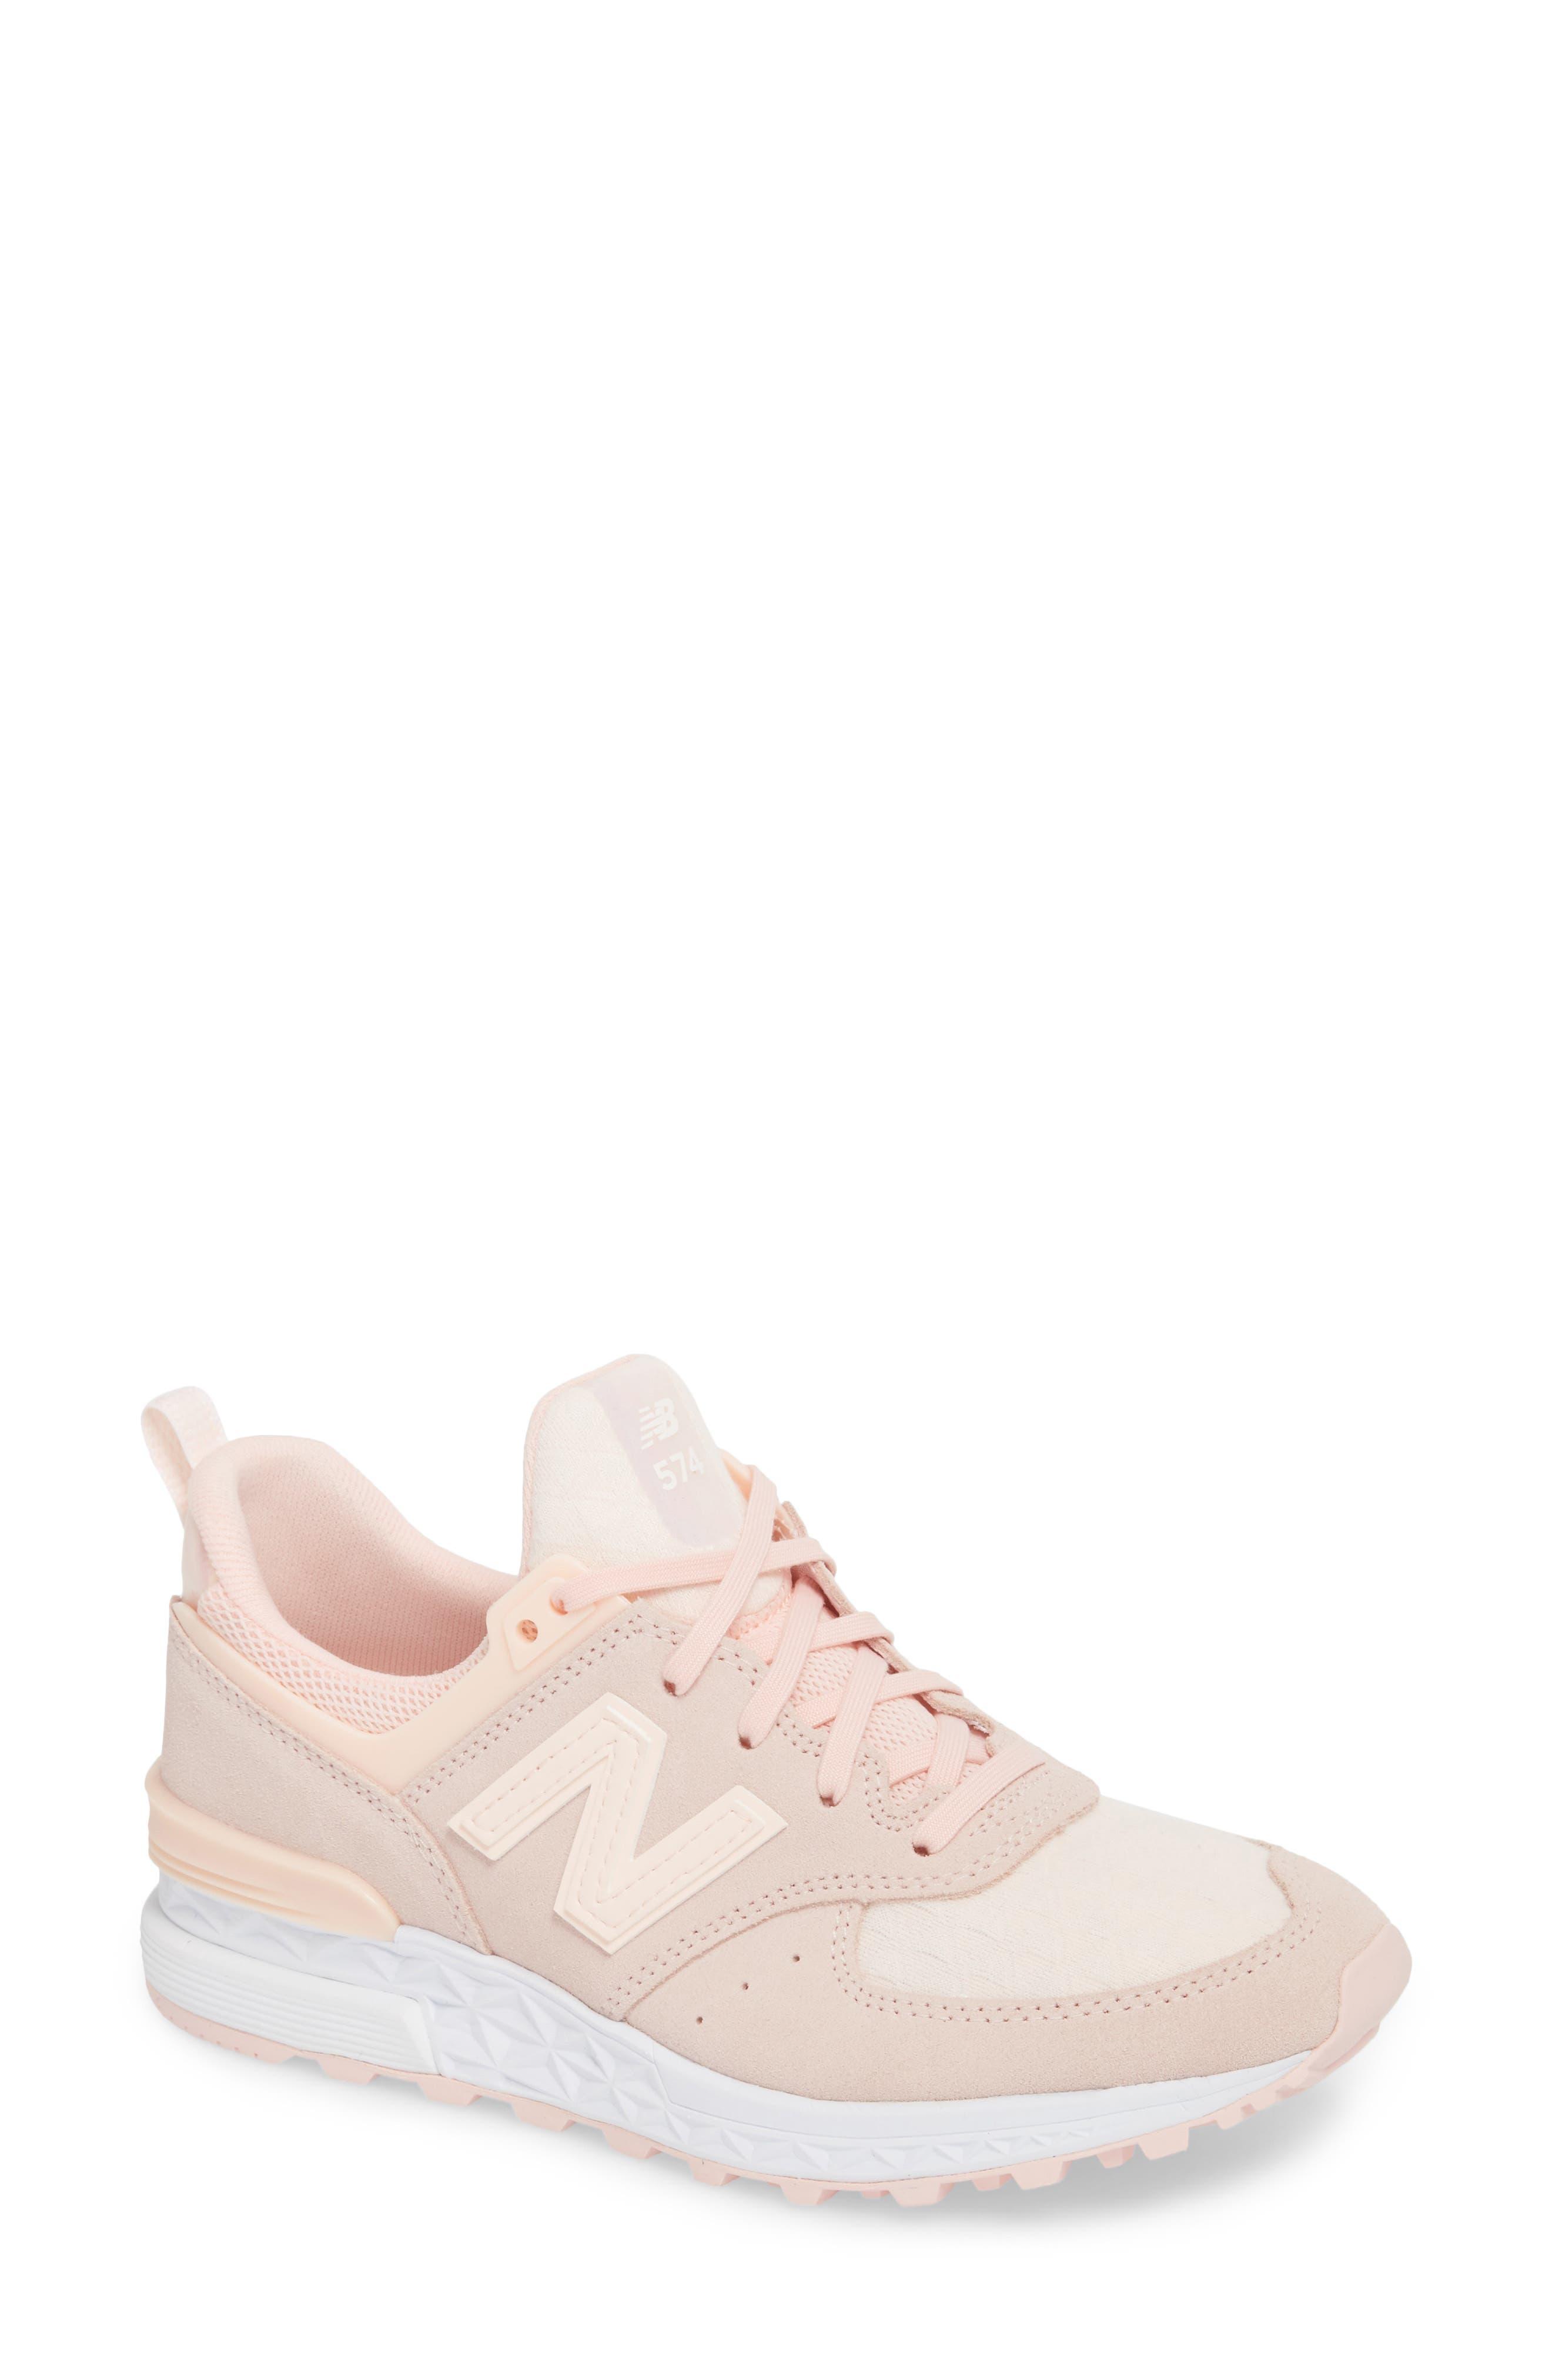 '574' Sneaker,                             Main thumbnail 1, color,                             Sunrise Glow